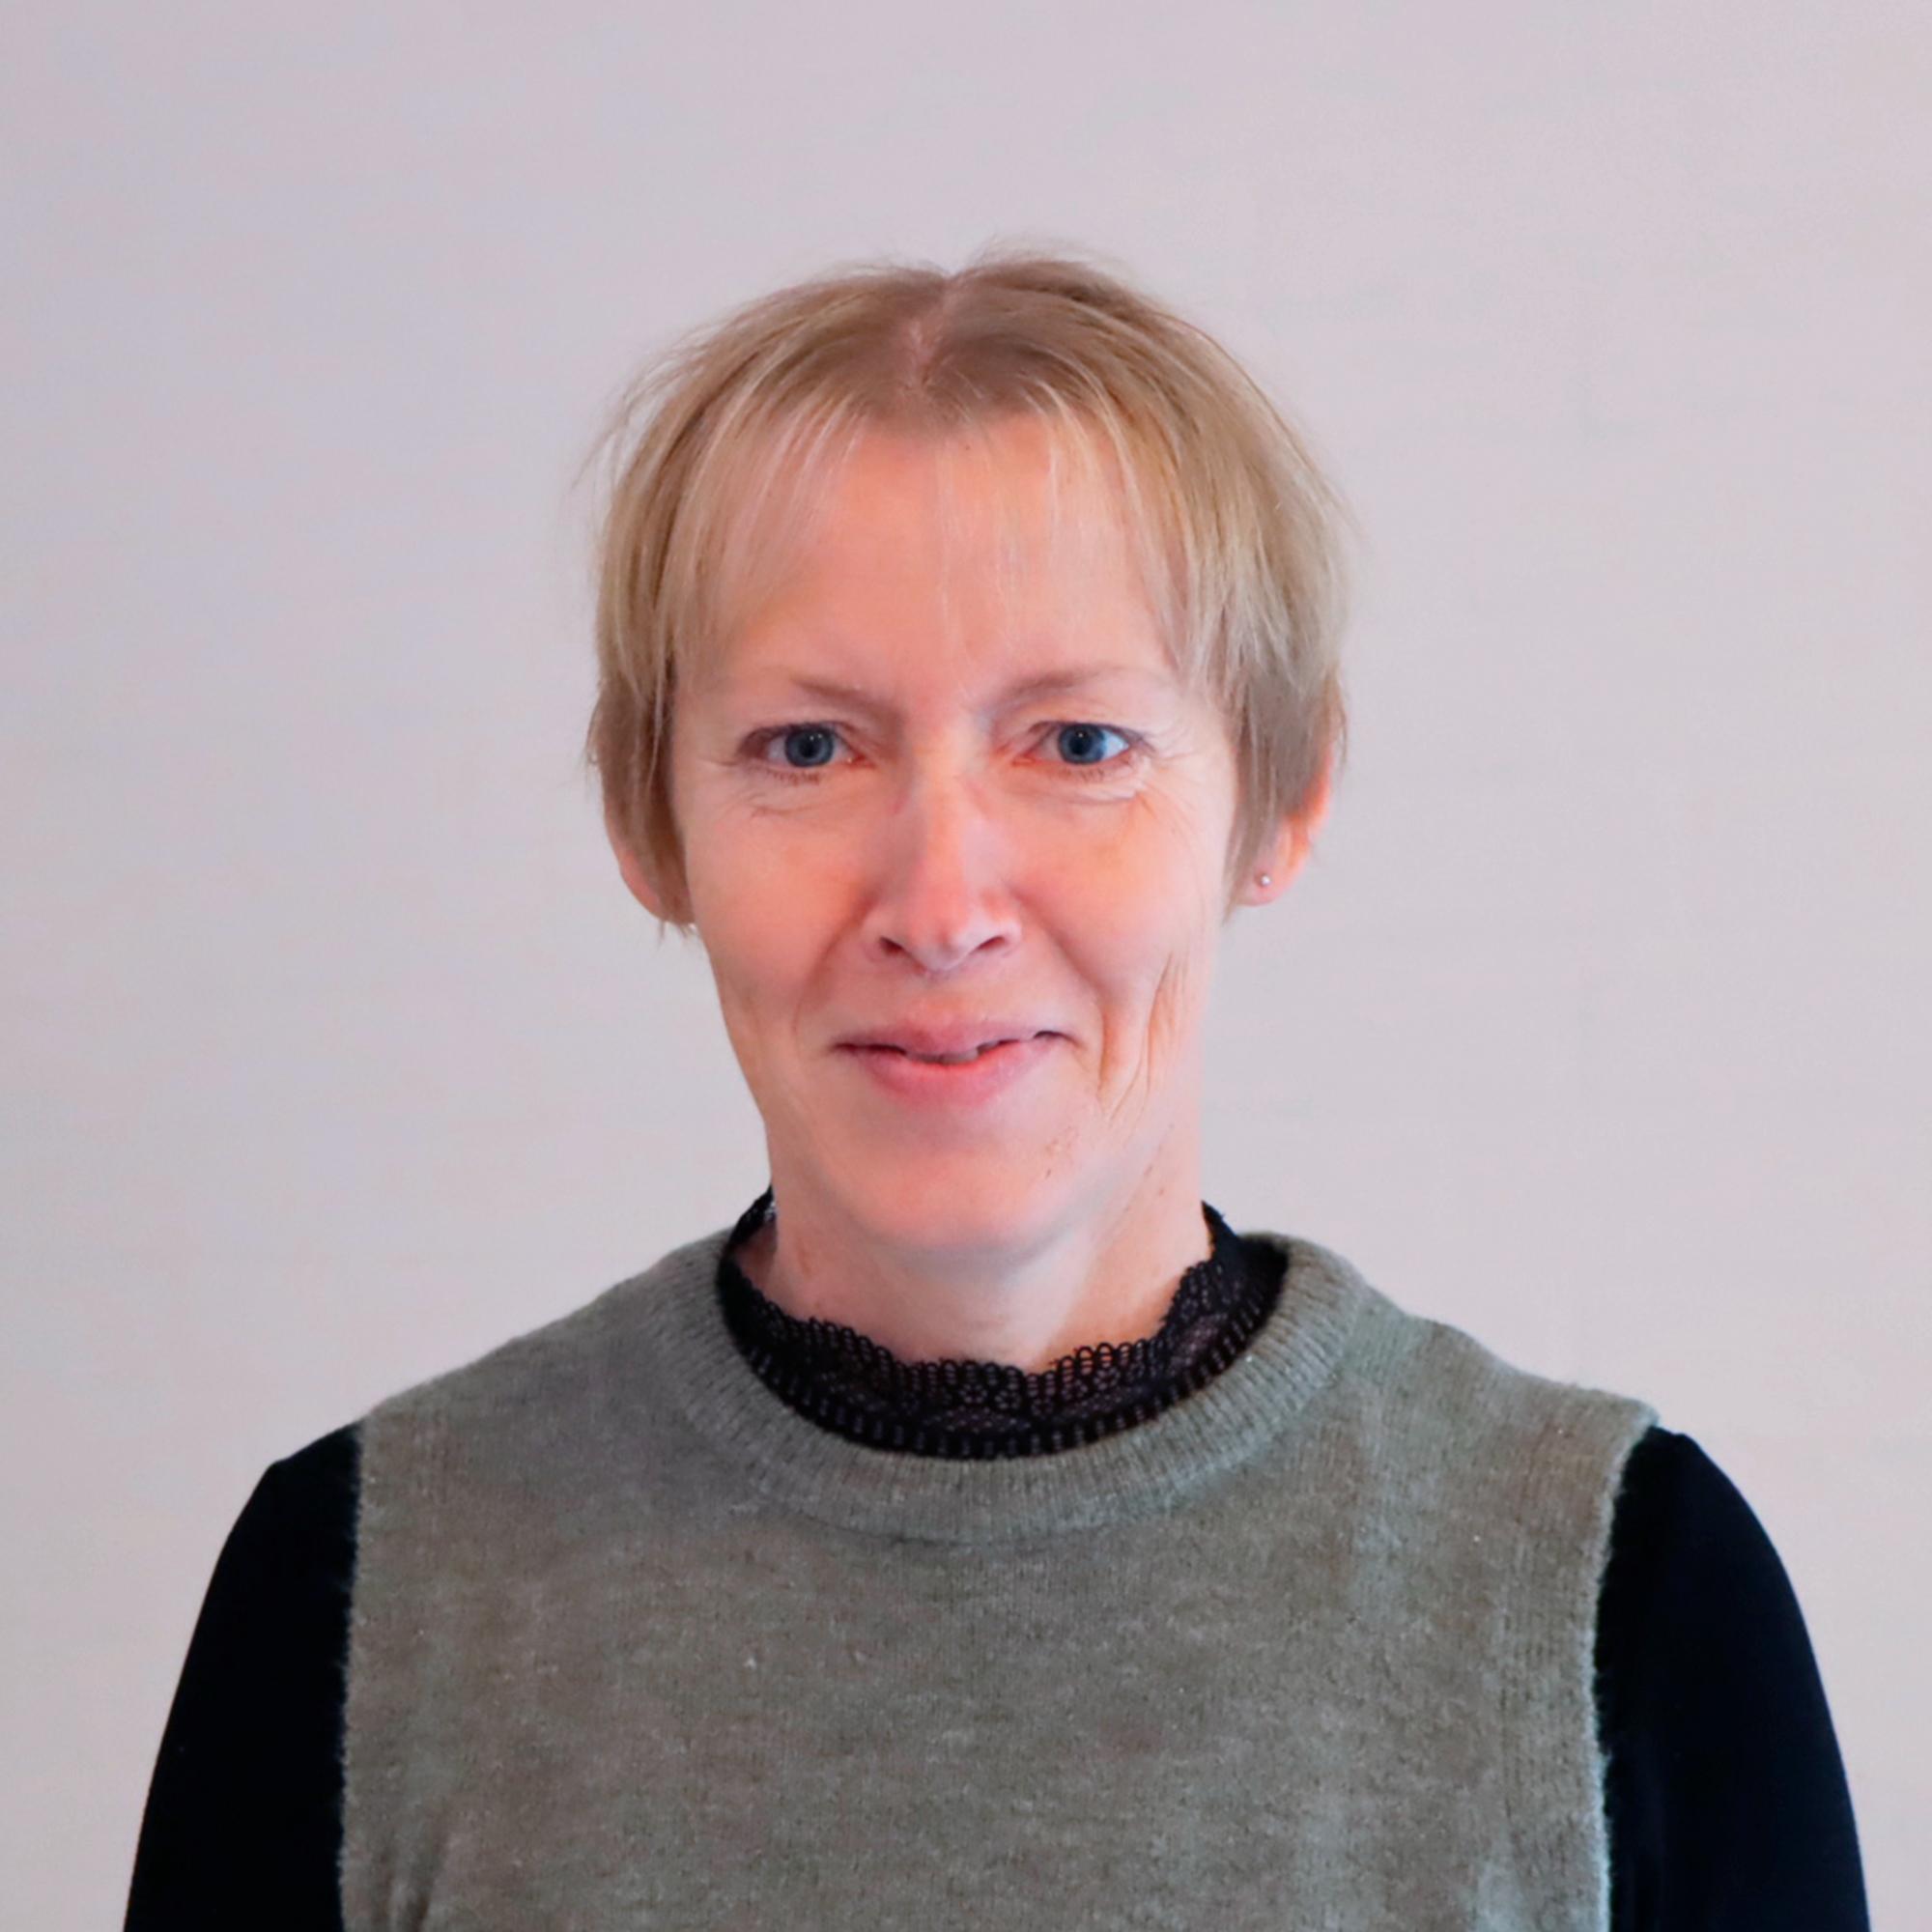 Birgitte Rath